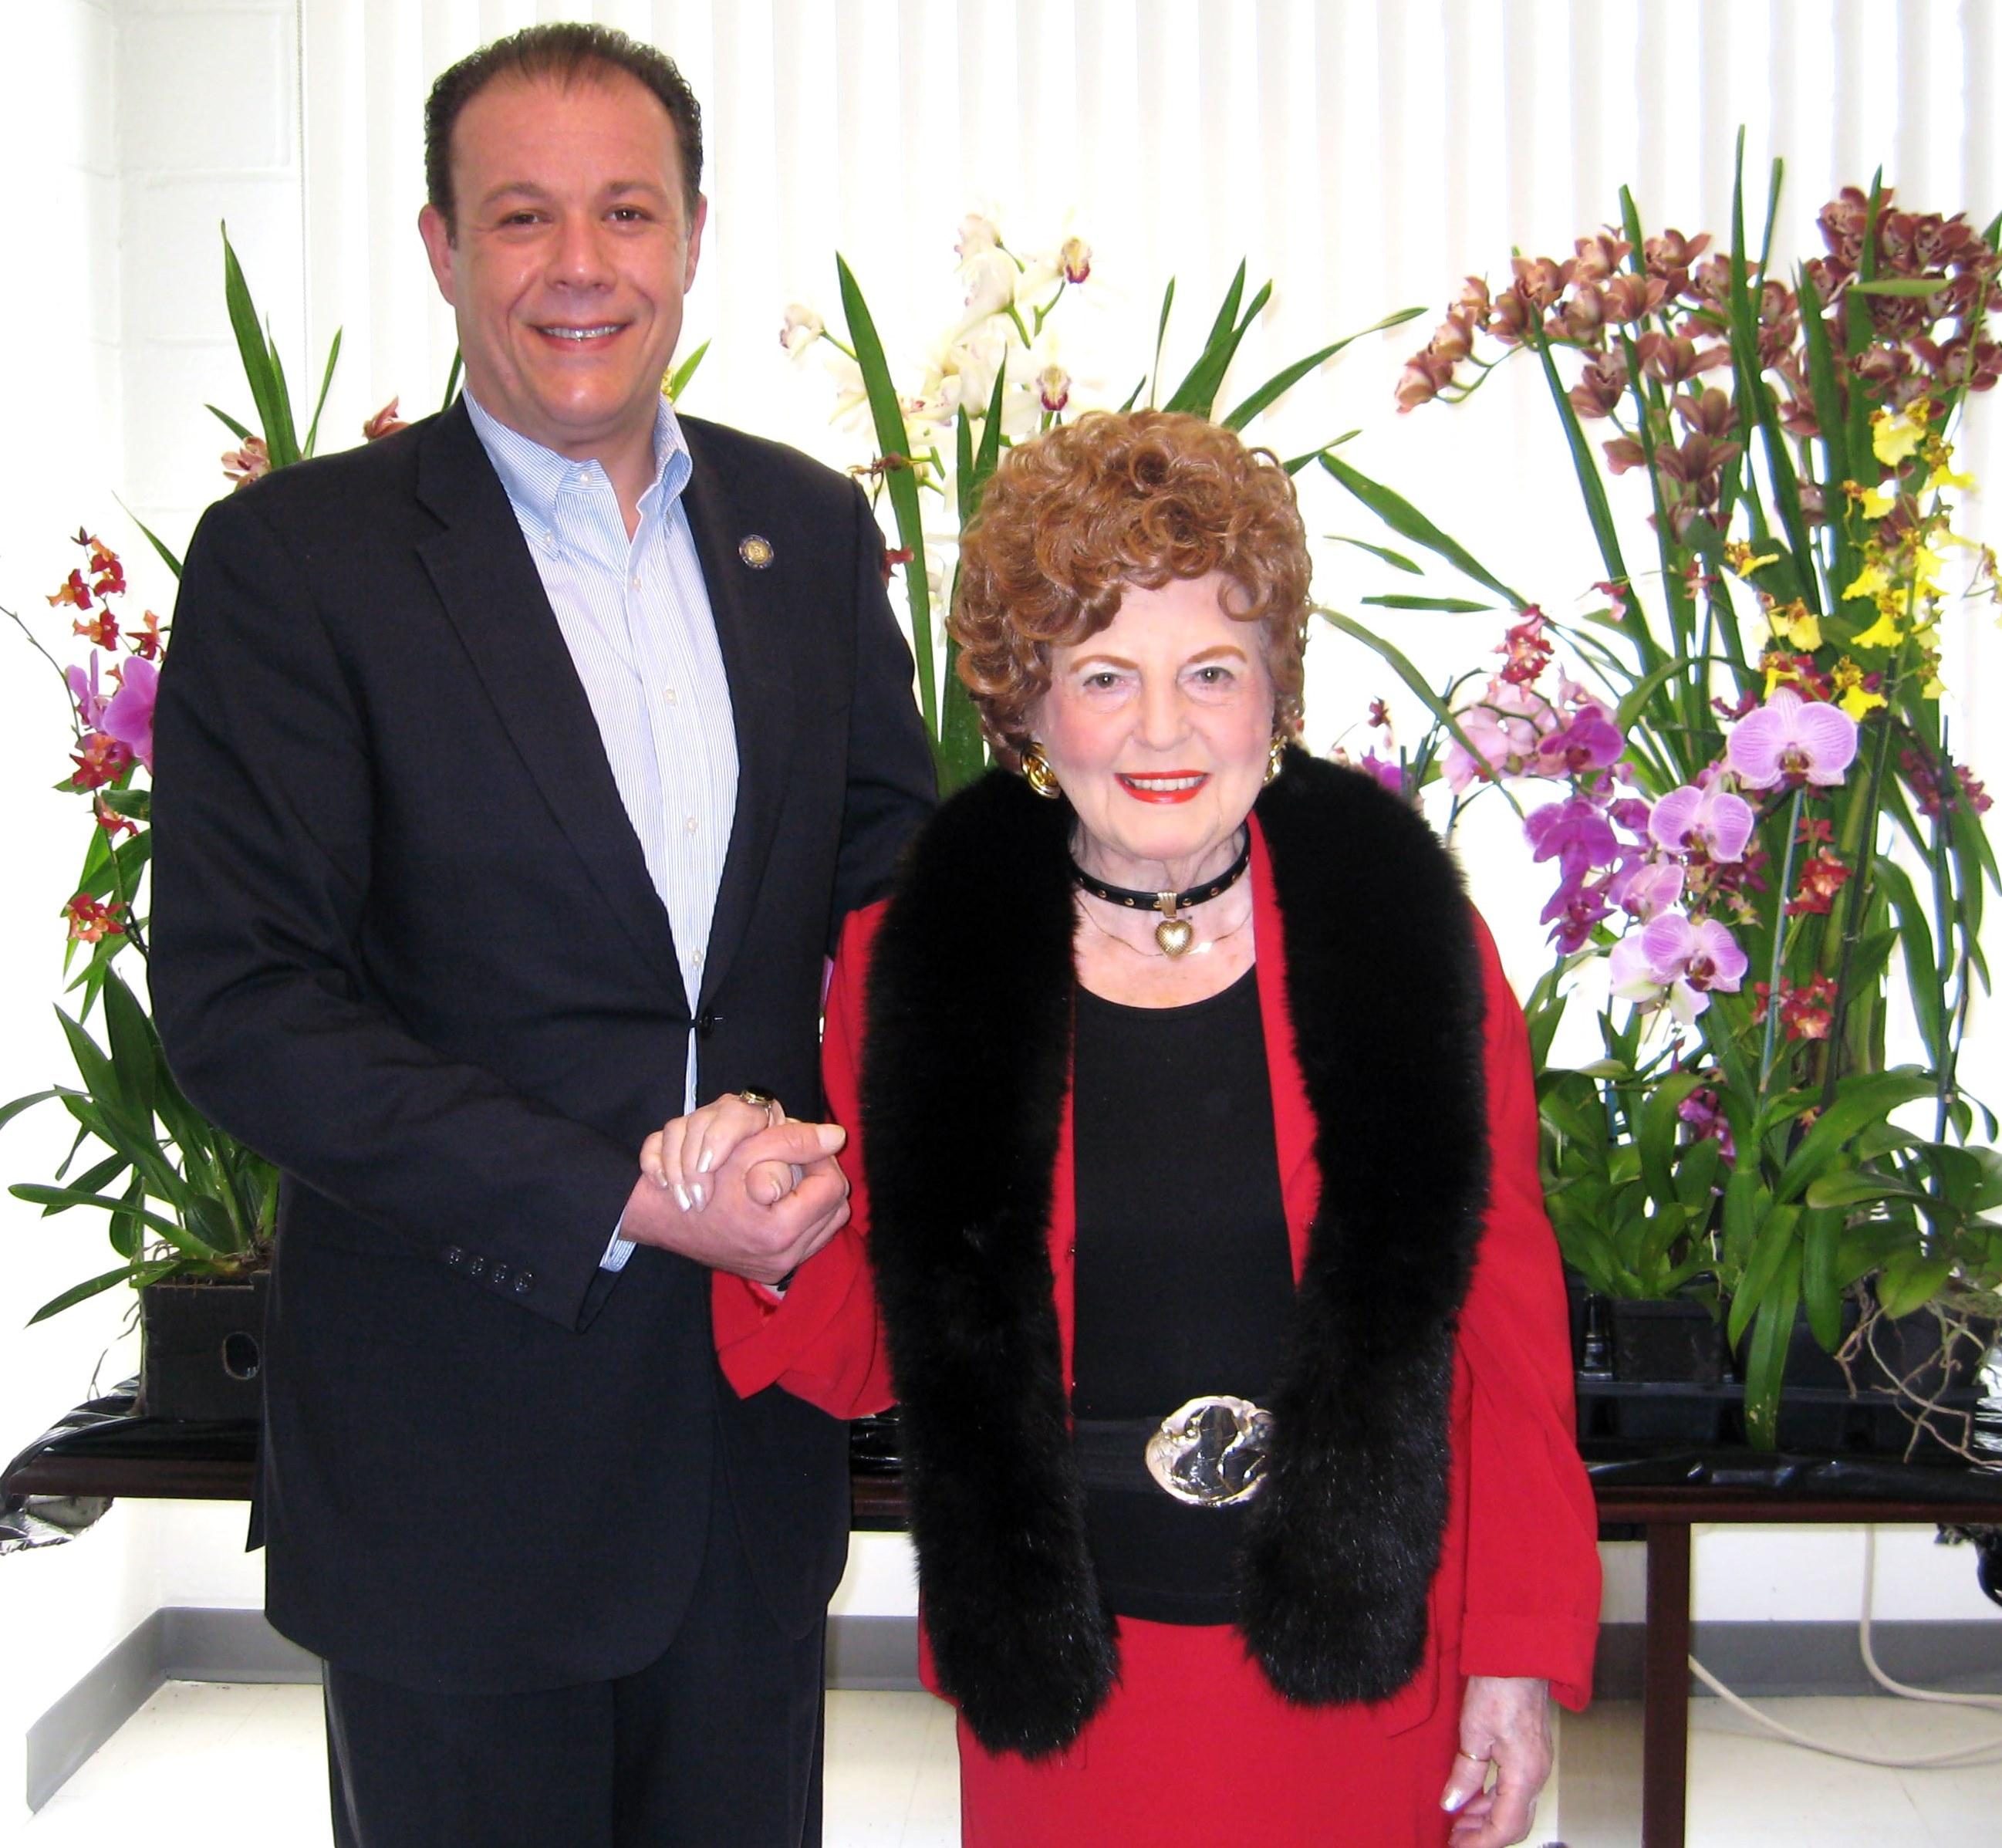 Bea and Assemblyman Gjonaj